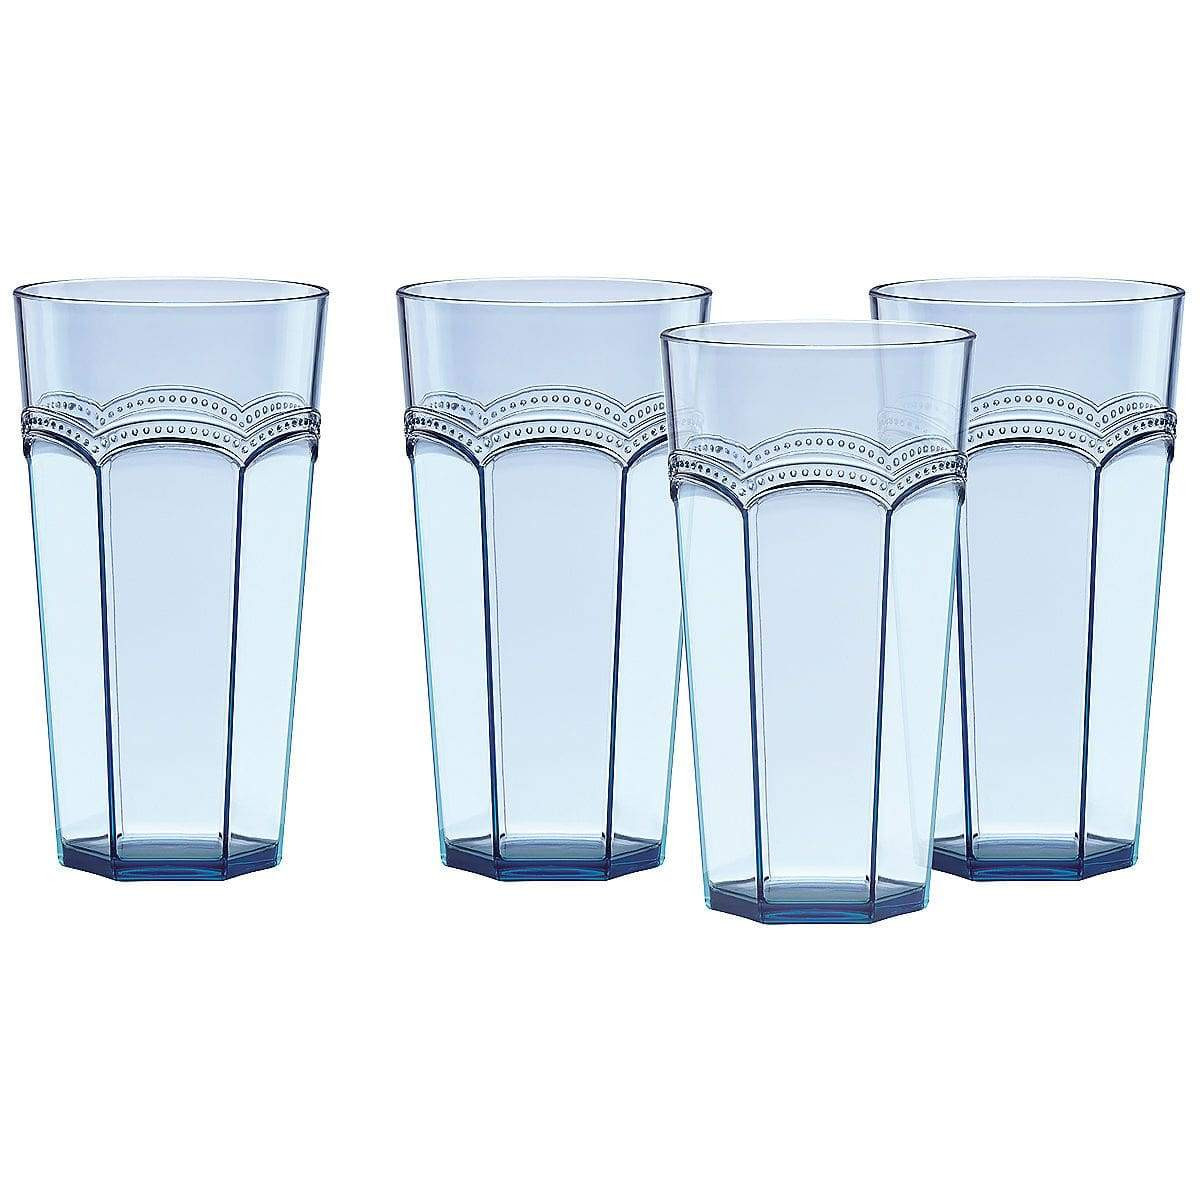 badash crystal vase of lenox drinkware giftware gallery in lenox french perle melamine aqua highball glasses set of 4 drinkware misc giftware gallery 688